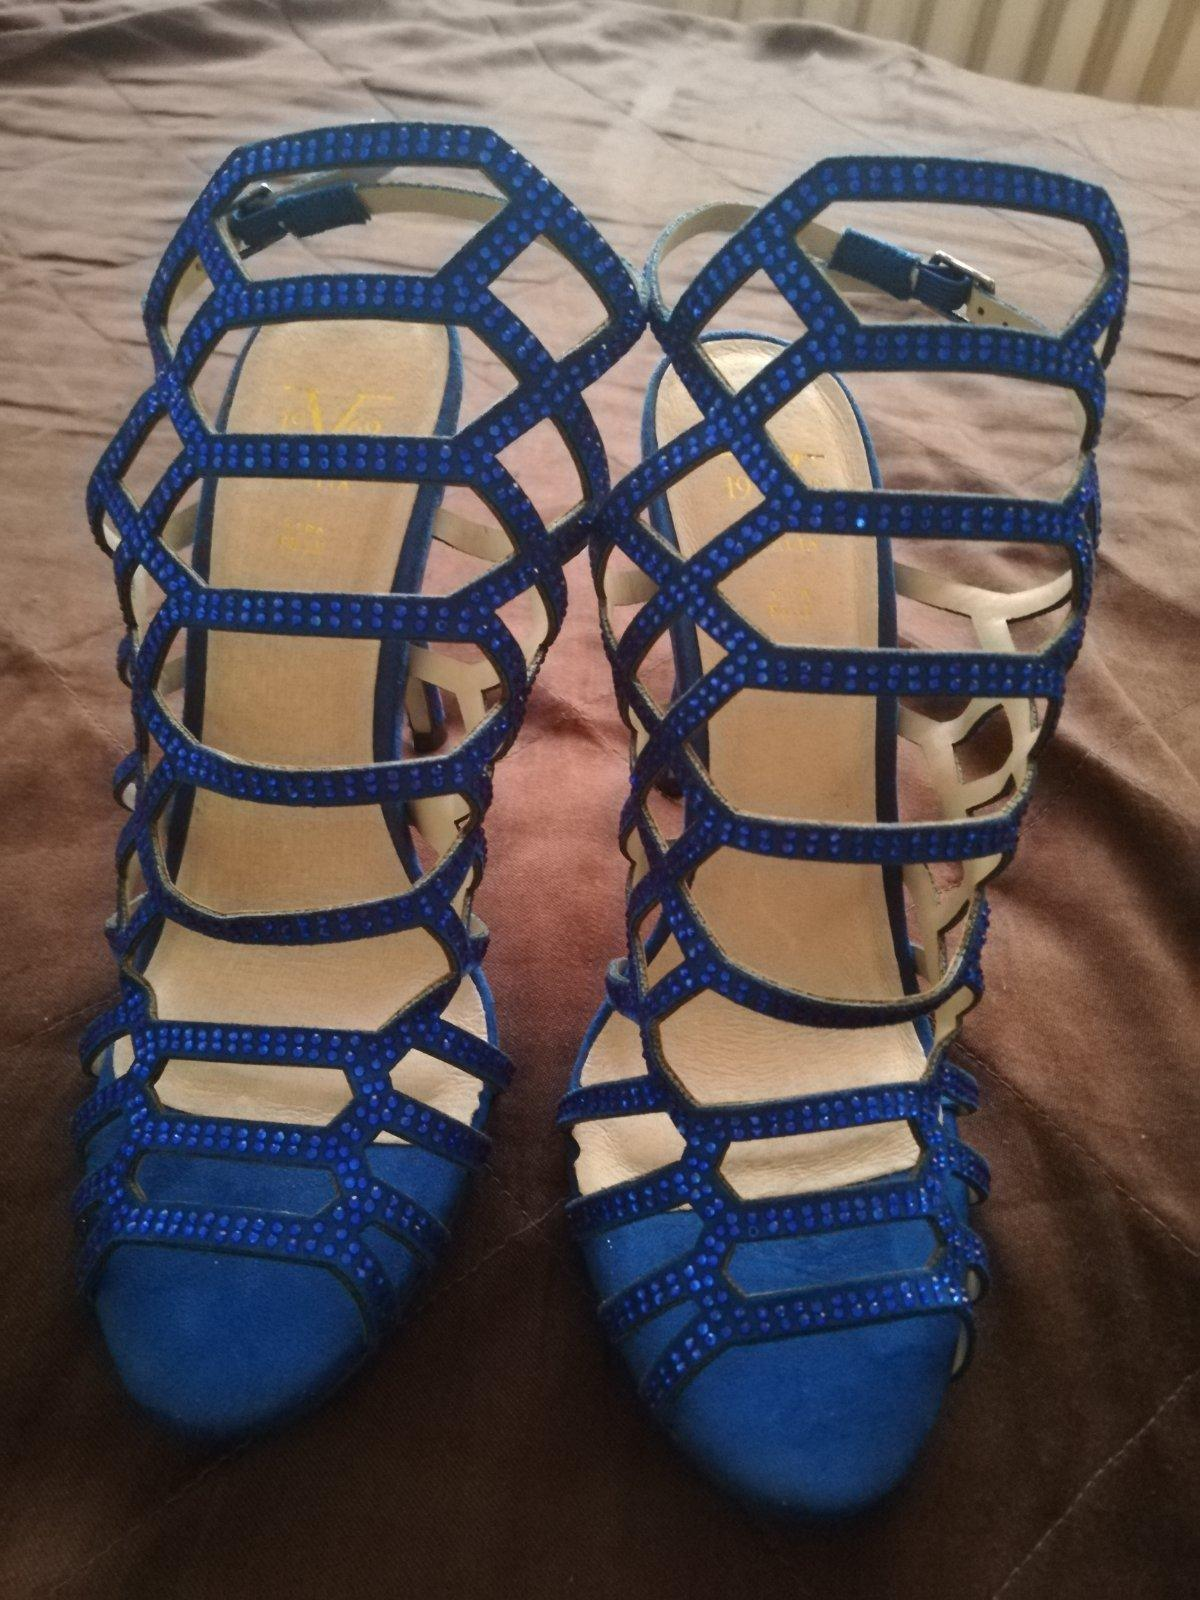 Sandalky kralovska modra - Obrázok č. 2